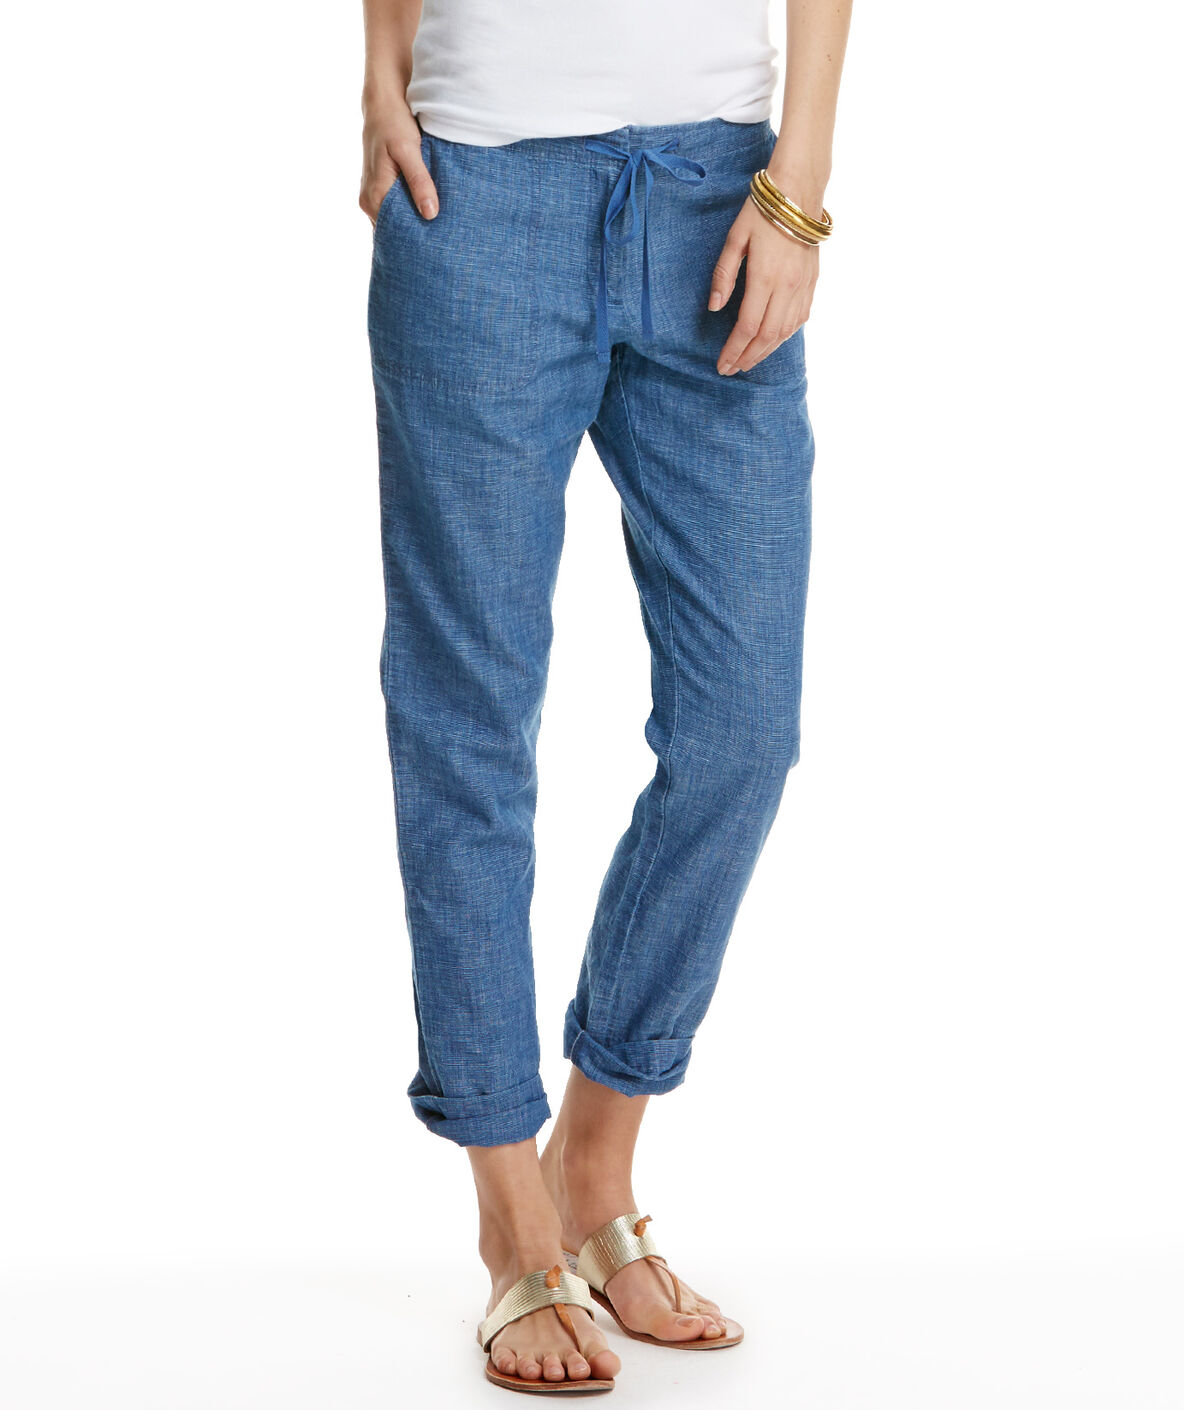 Shop boardwalk chambray pants at vineyard vines for Chambray jeans